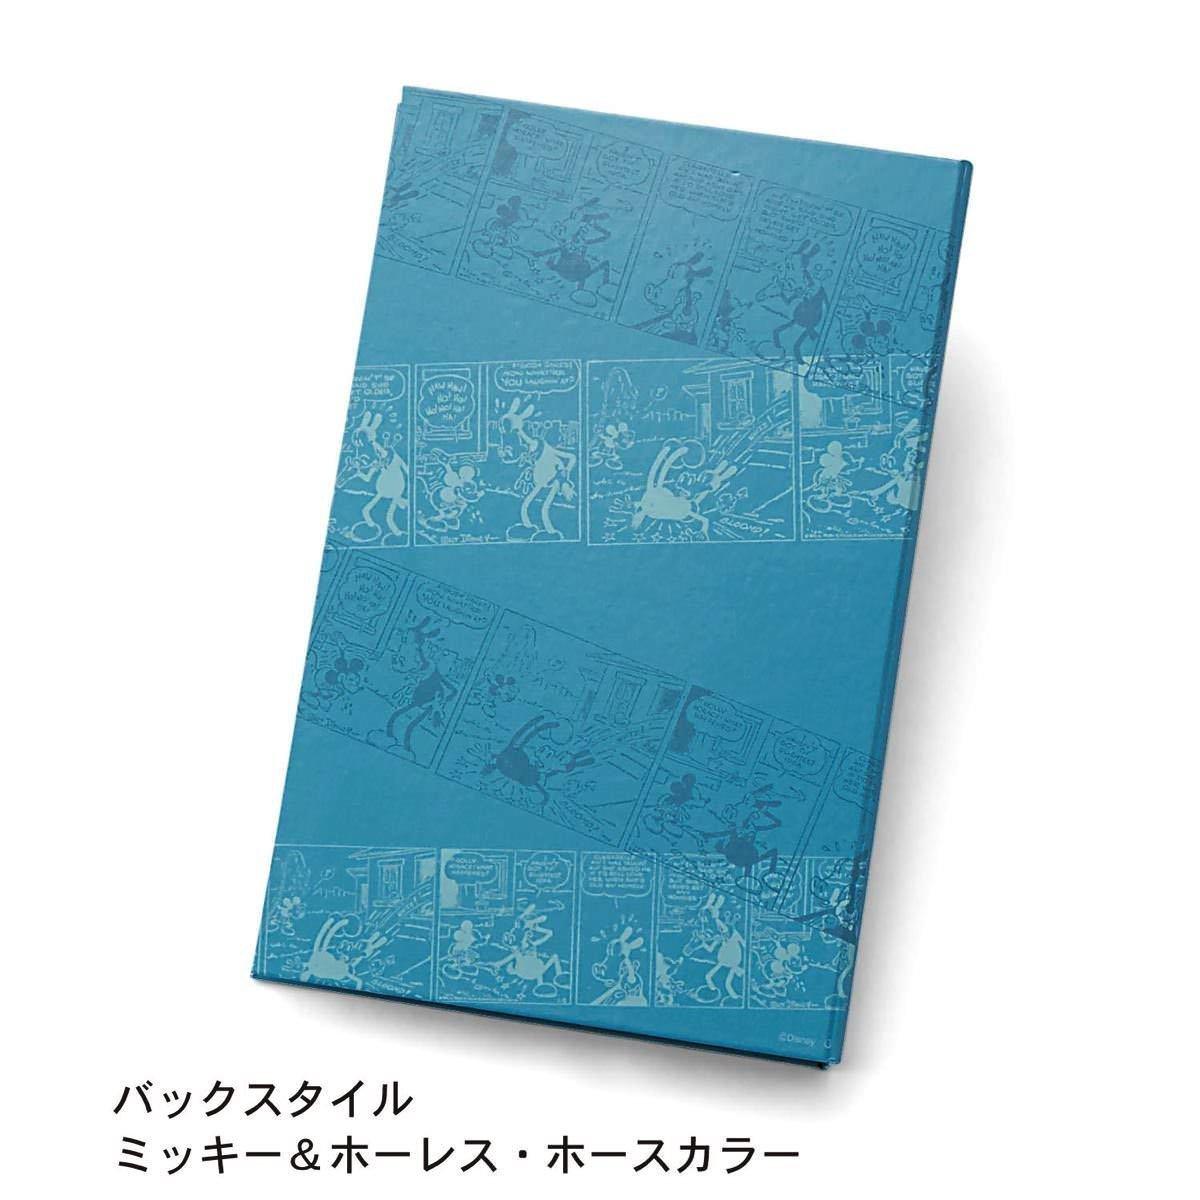 (Mickey and Horace Horsecollar) Japan Disney Mickey and Horace Horsecollar cartoon album for instax mini film